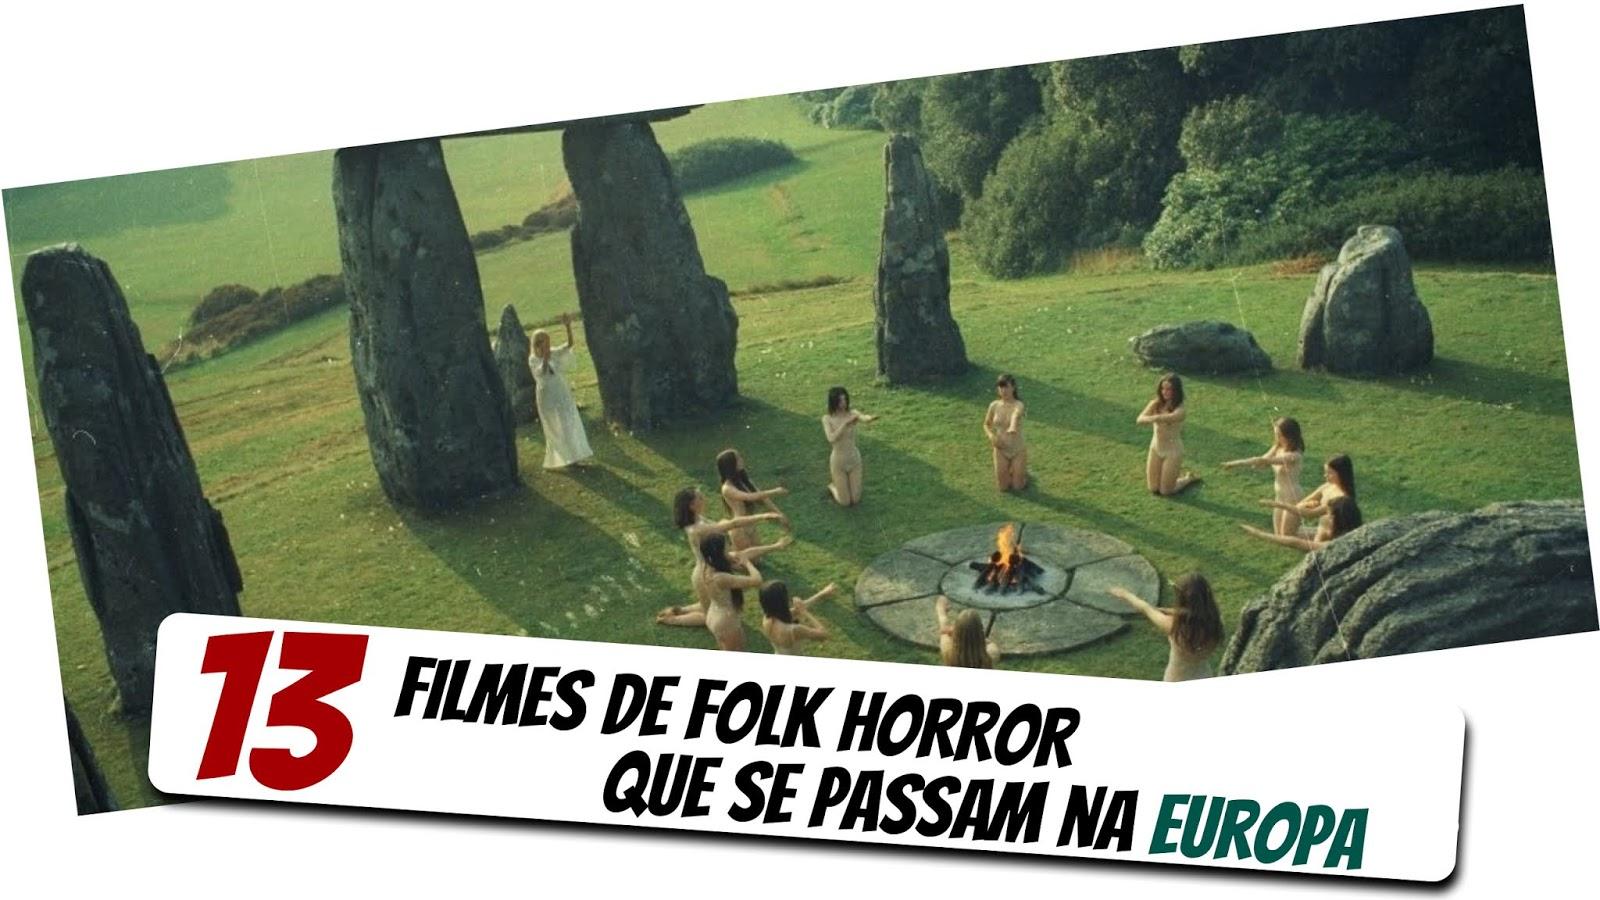 13-filmes-de-folk-horror-europeus